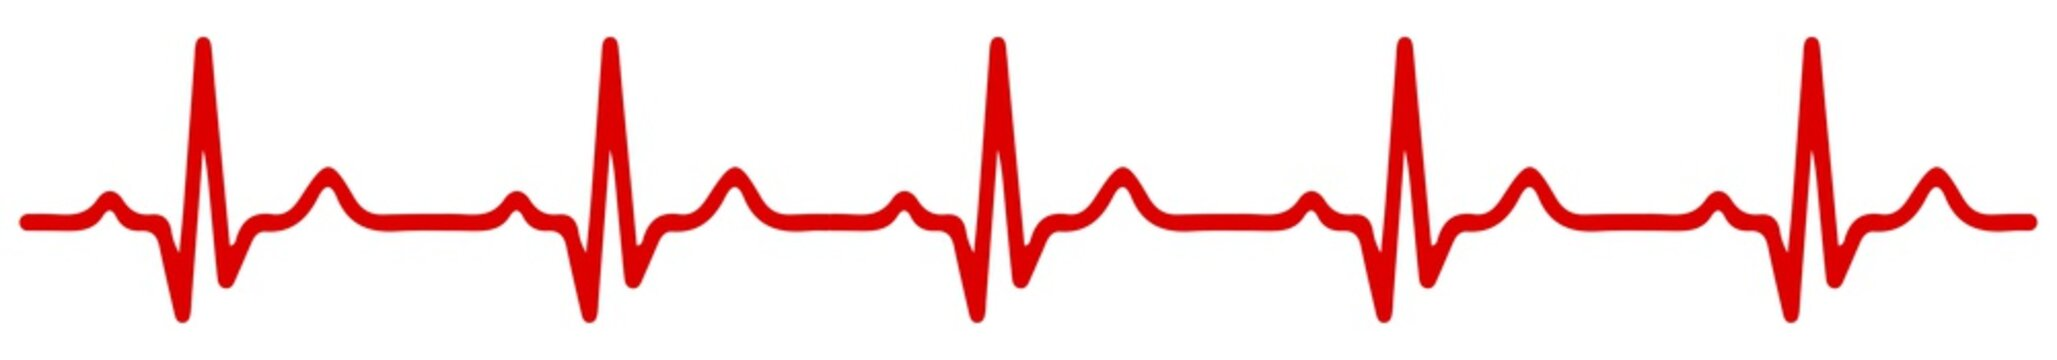 Heart pulse, one line, cardiogram - vector